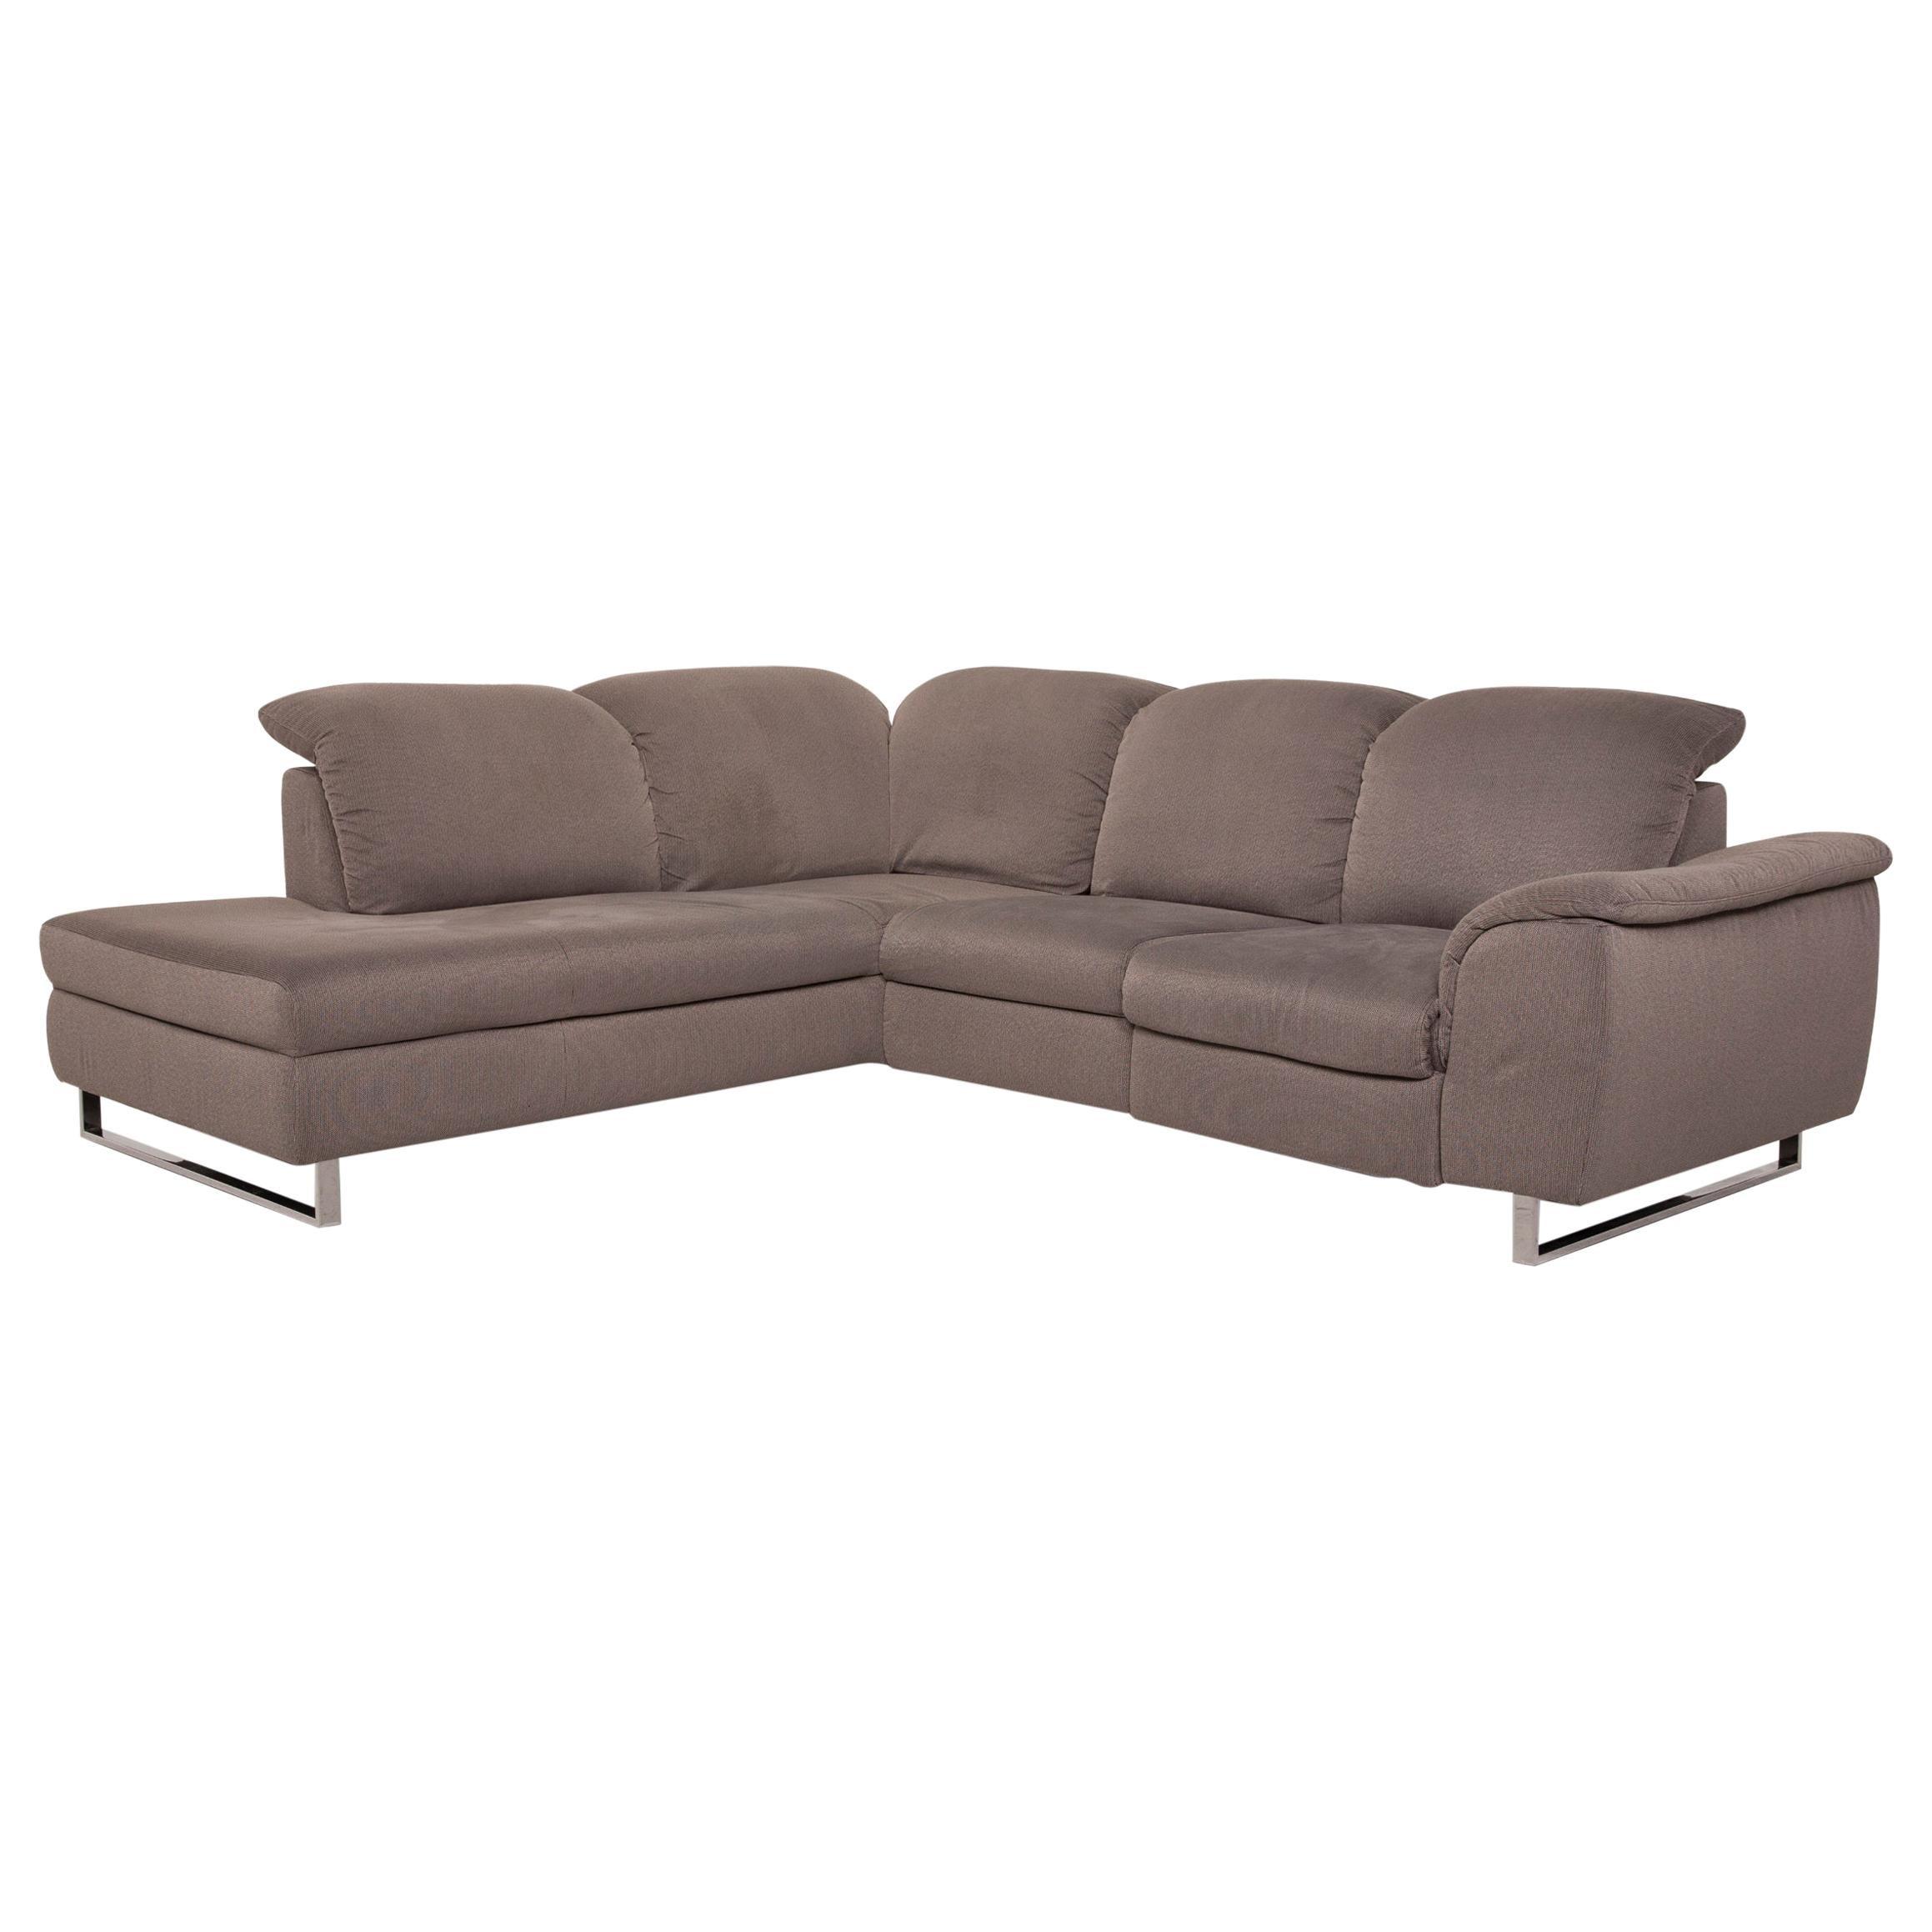 Ewald Schillig Sinaatra Fabric Sofa Gray Corner Sofa Electrical Function